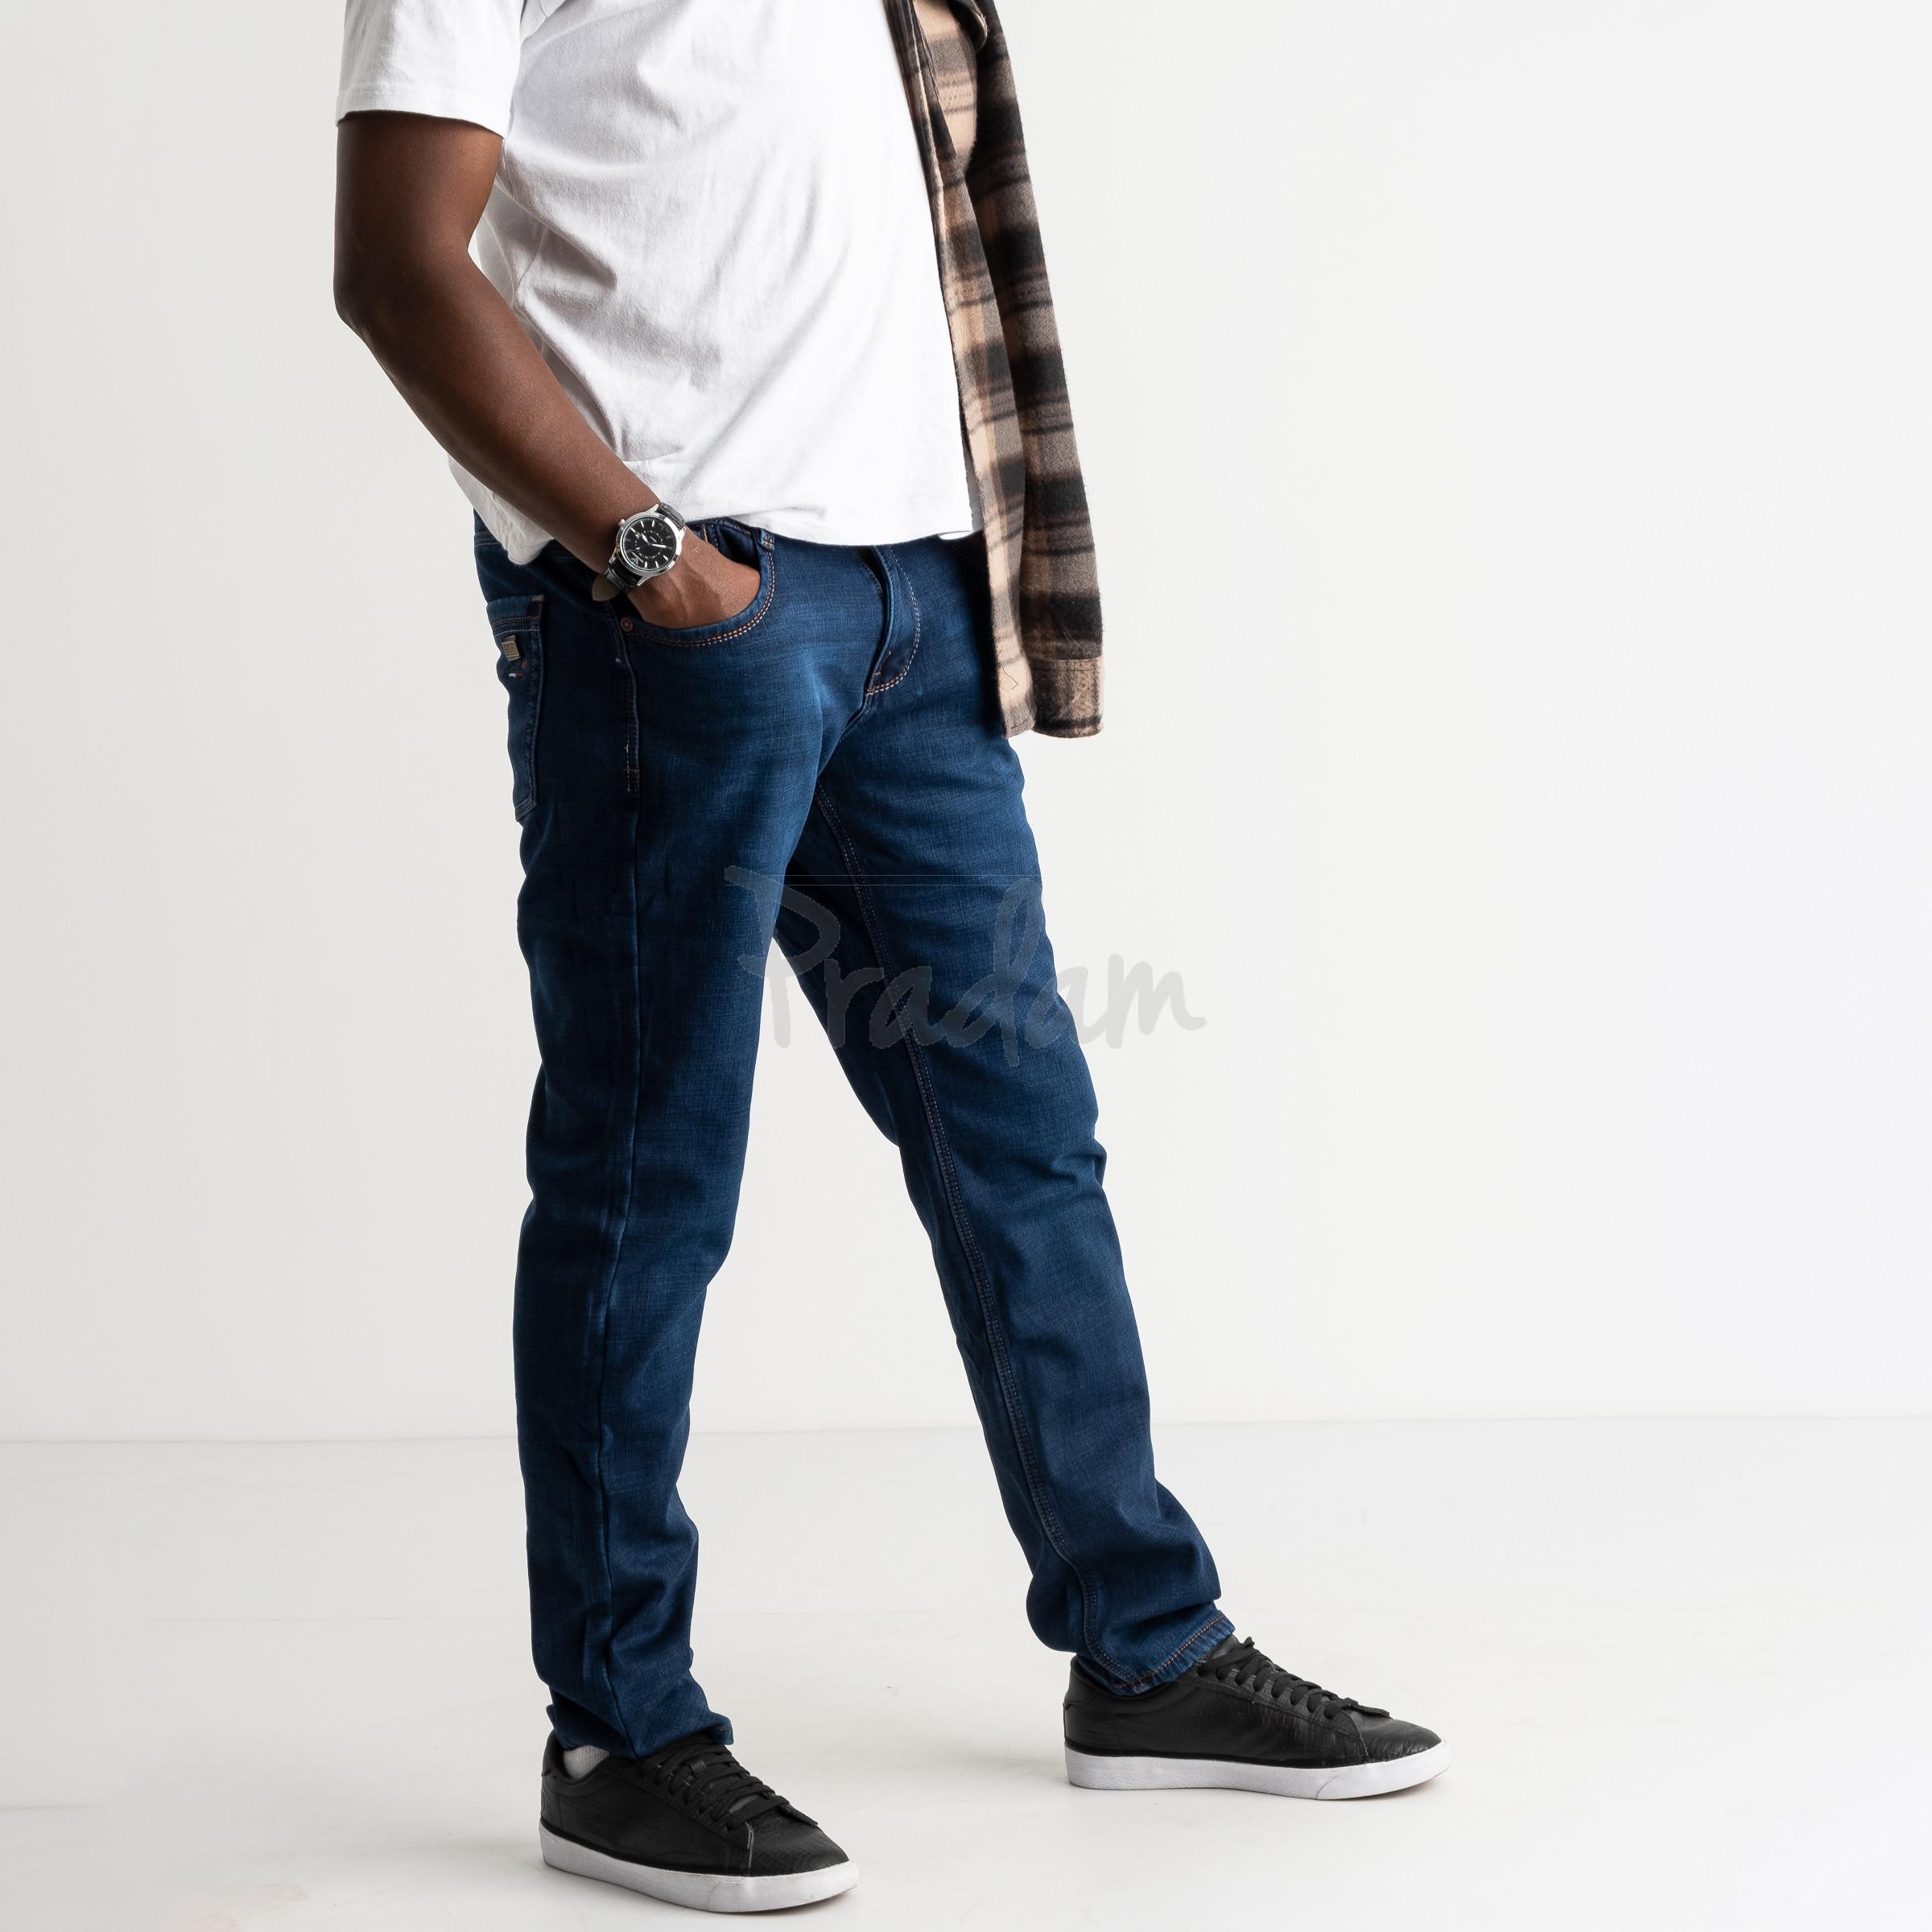 2131 Dsouaviet синие джинсы мужские стрейчевые на флисе (8 ед.размеры: 29.30.31.32.33.34.36.38)